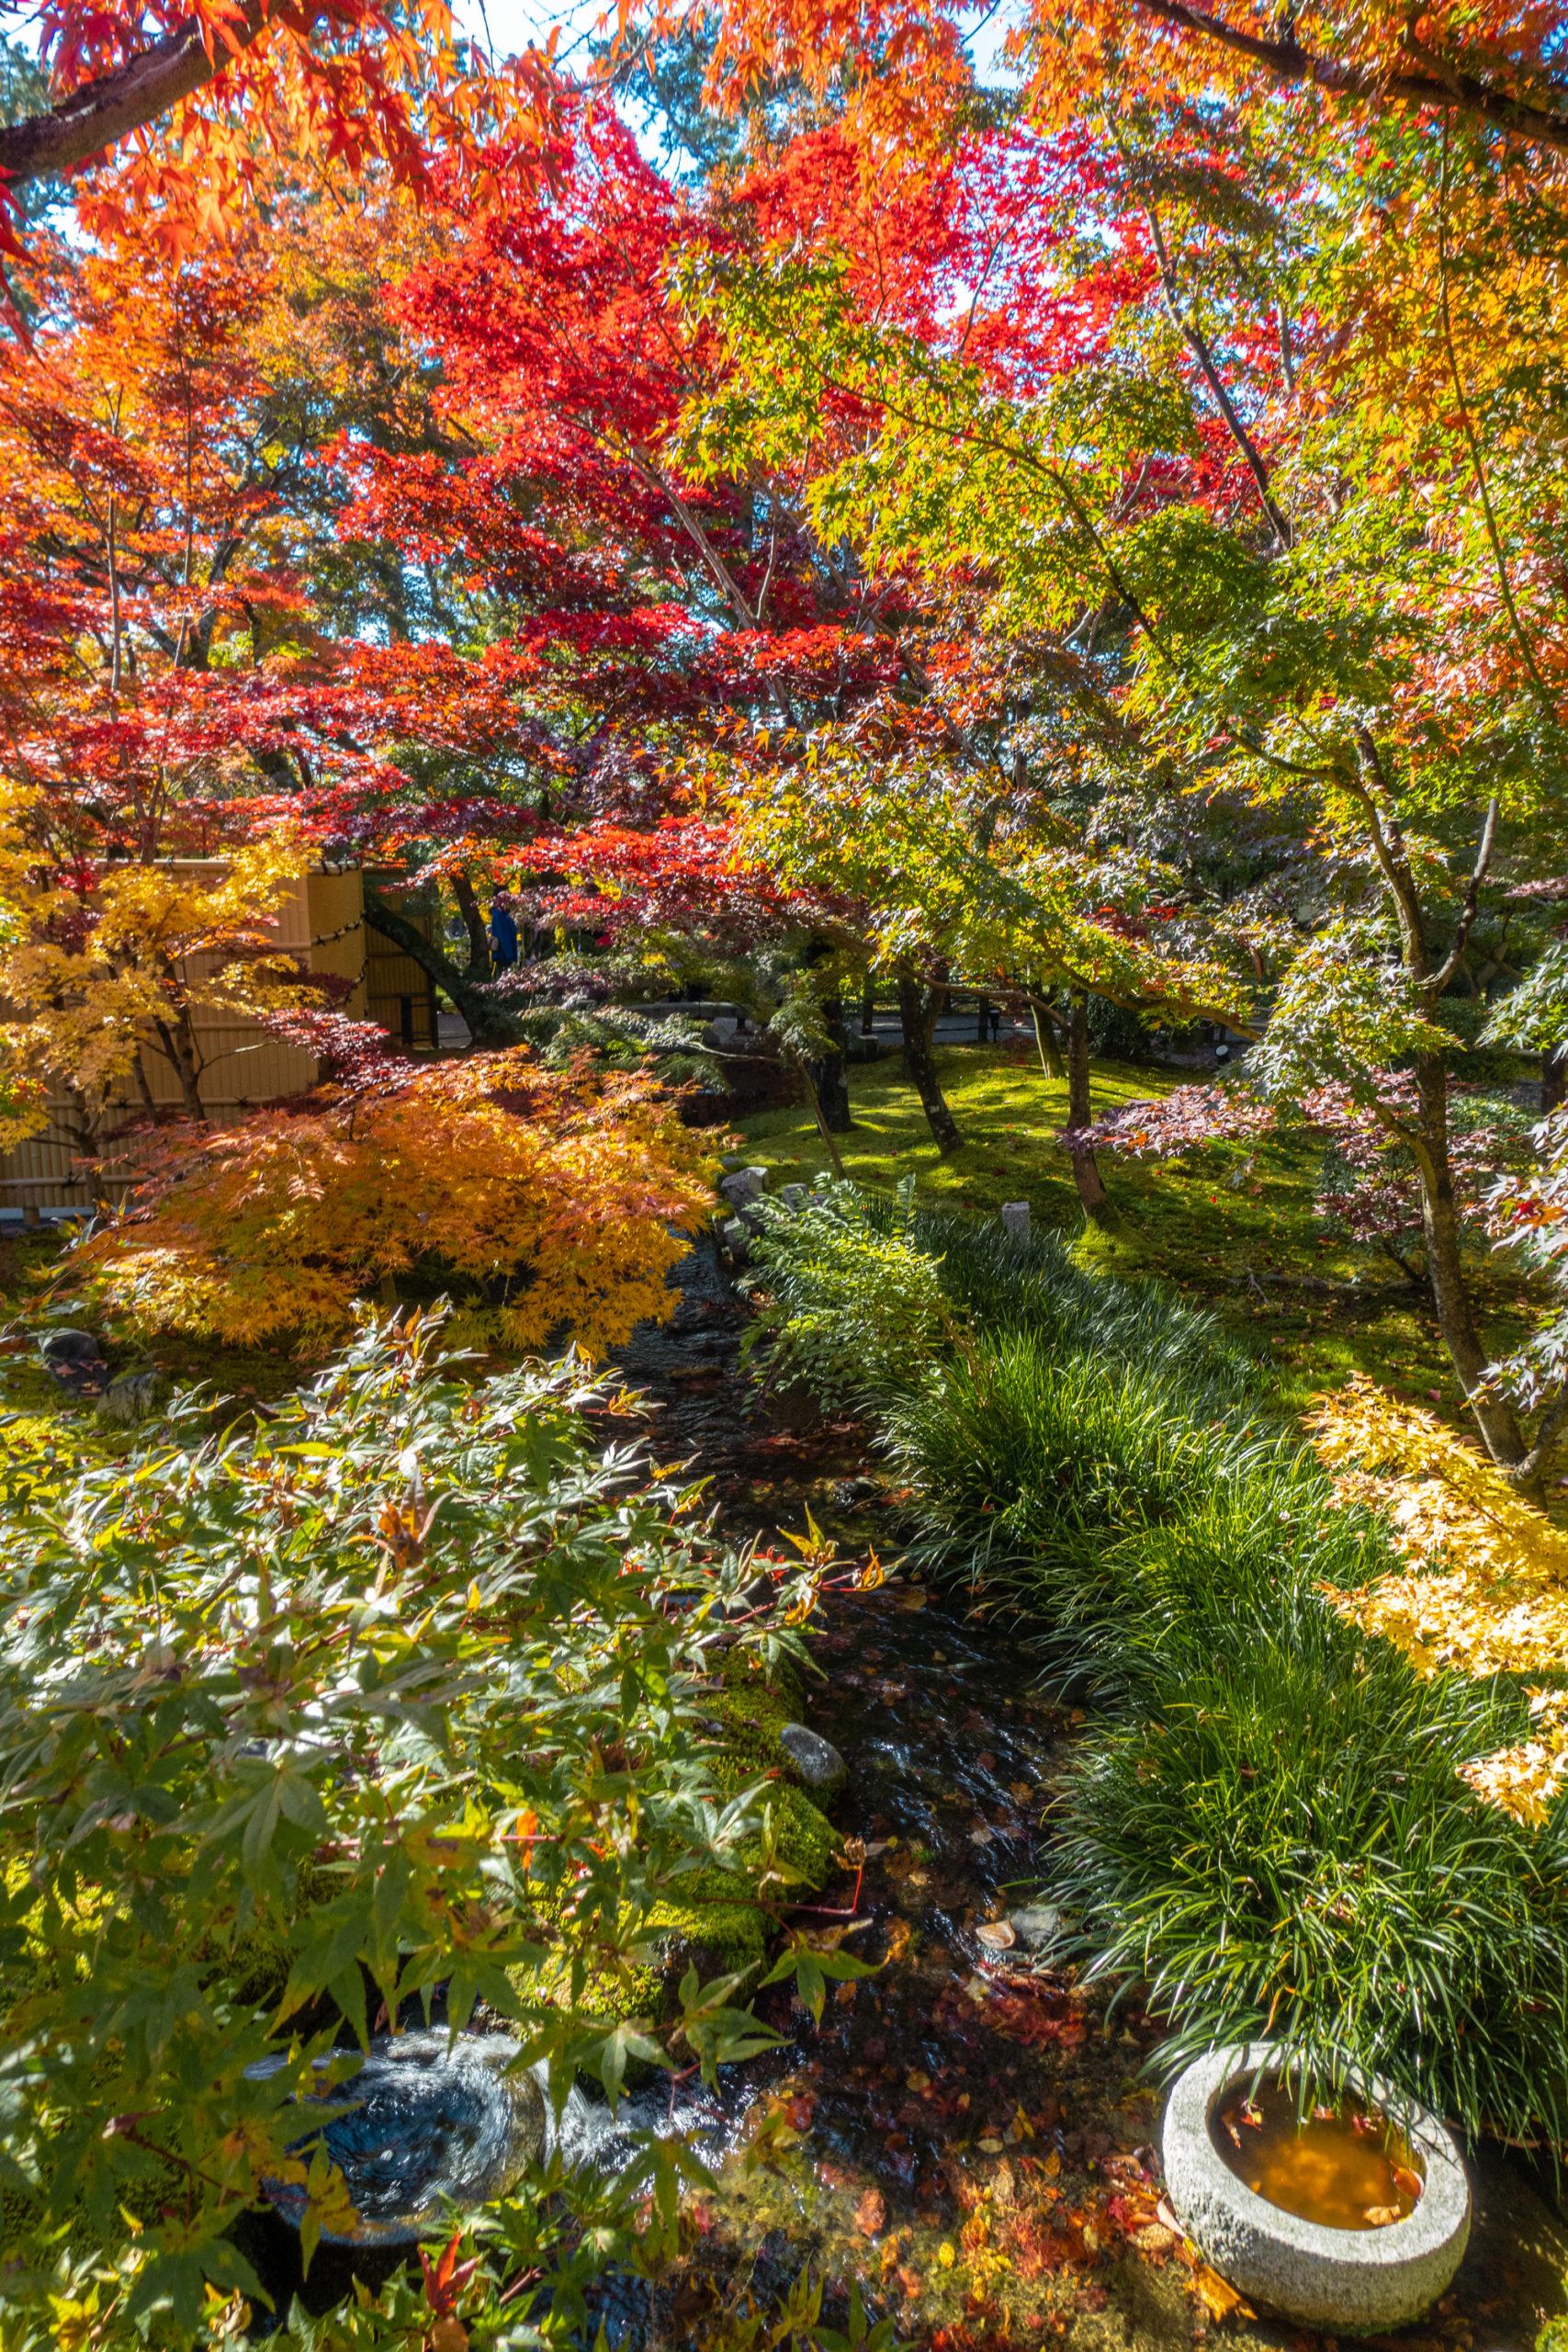 DSC00708-scaled 京都  永観堂-禅林寺(池に映る紅葉の風景が美しい秋におすすめのスポット!撮影した写真の紹介、アクセス情報・ライトアップ情報など)